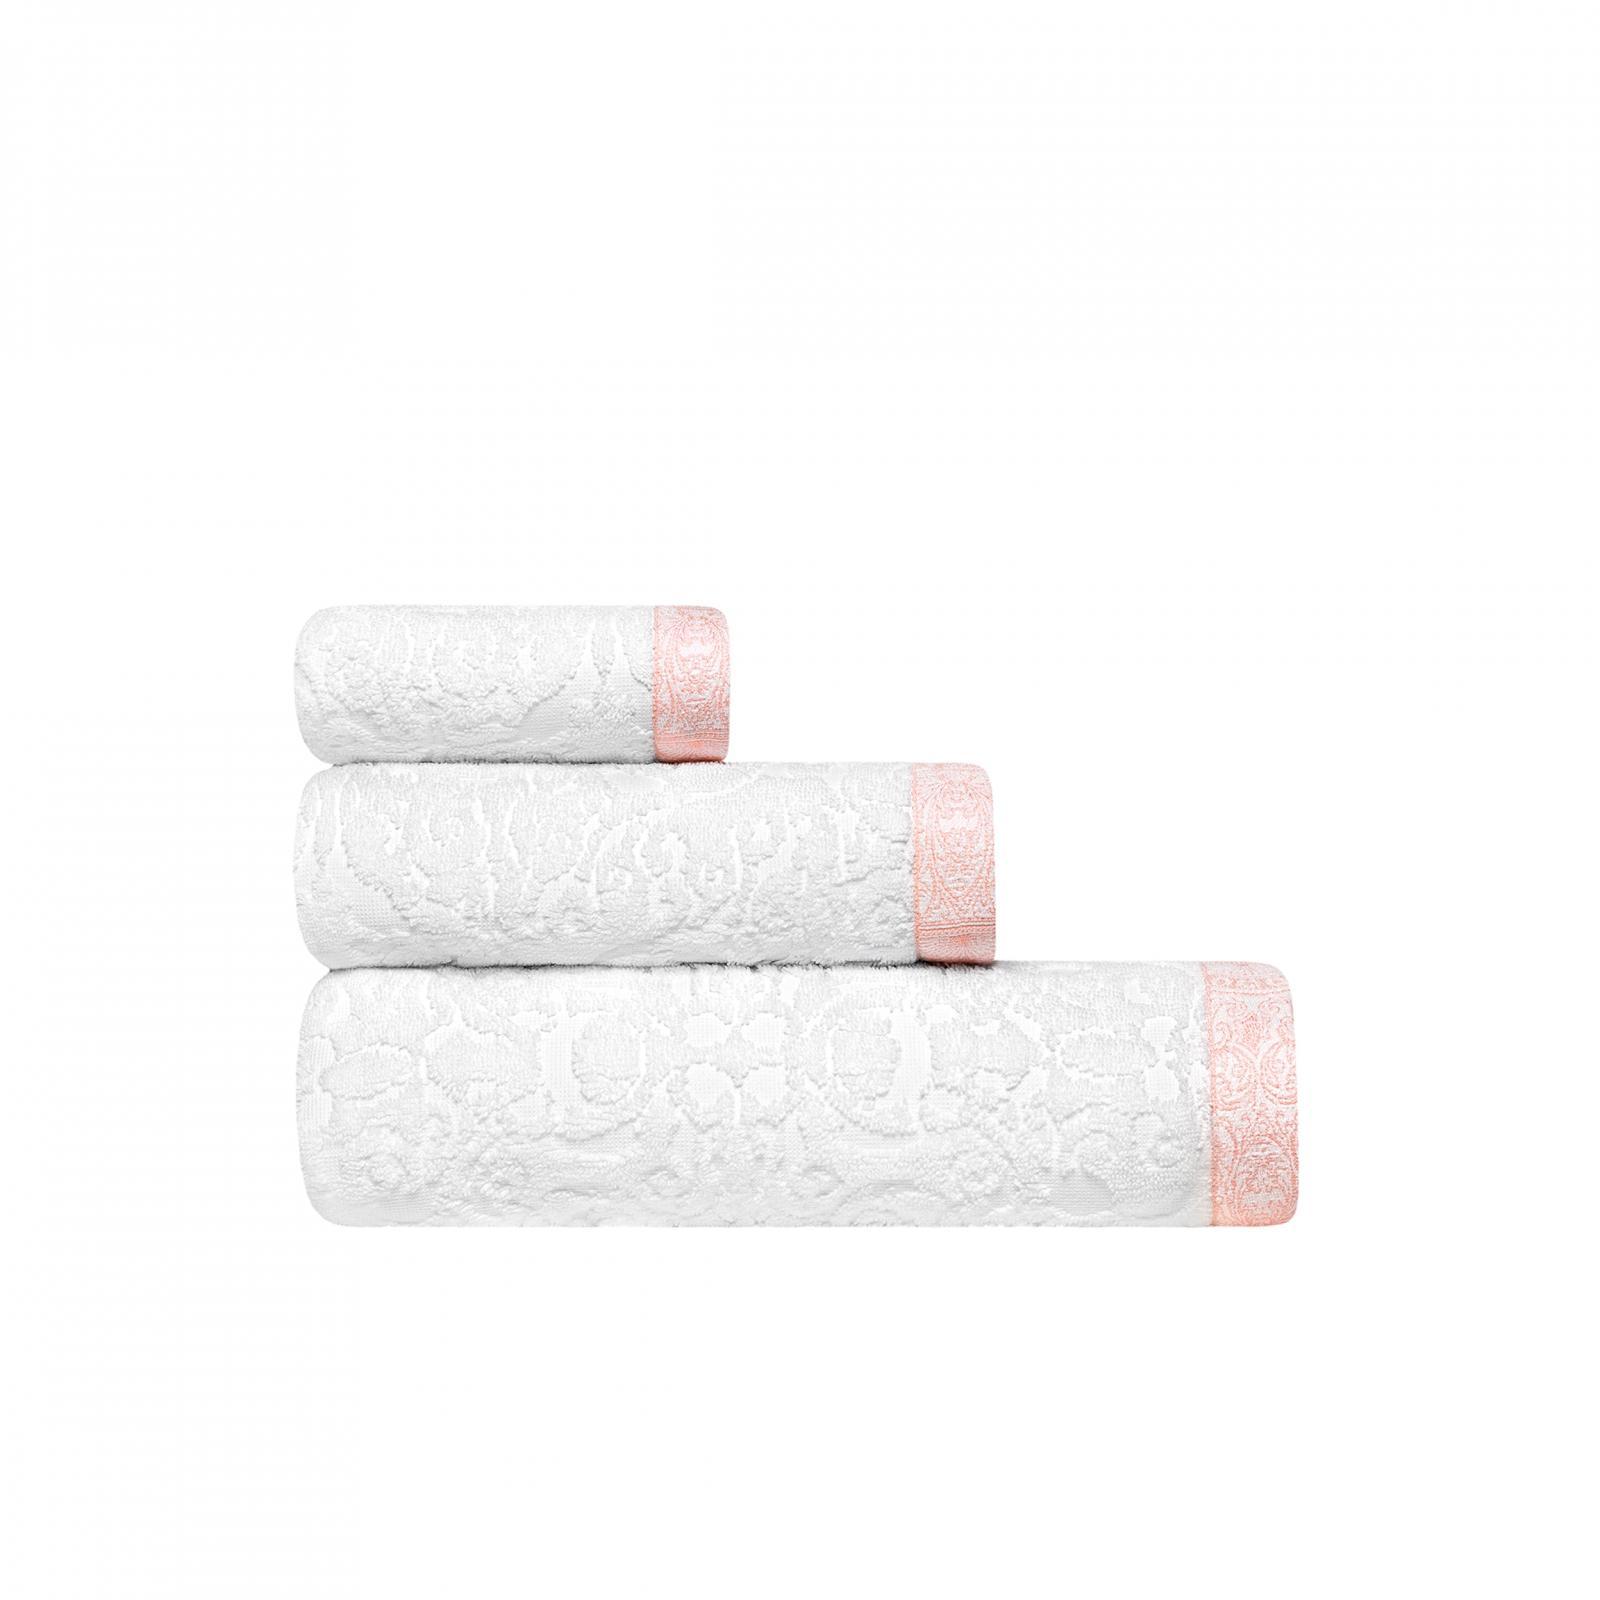 Фото - Комплект полотенец Togas Элизабет 40х60/50х100/70х140 см 3 шт комплект полотенец togas миэль темно серый 2 пр 50х100 70х140